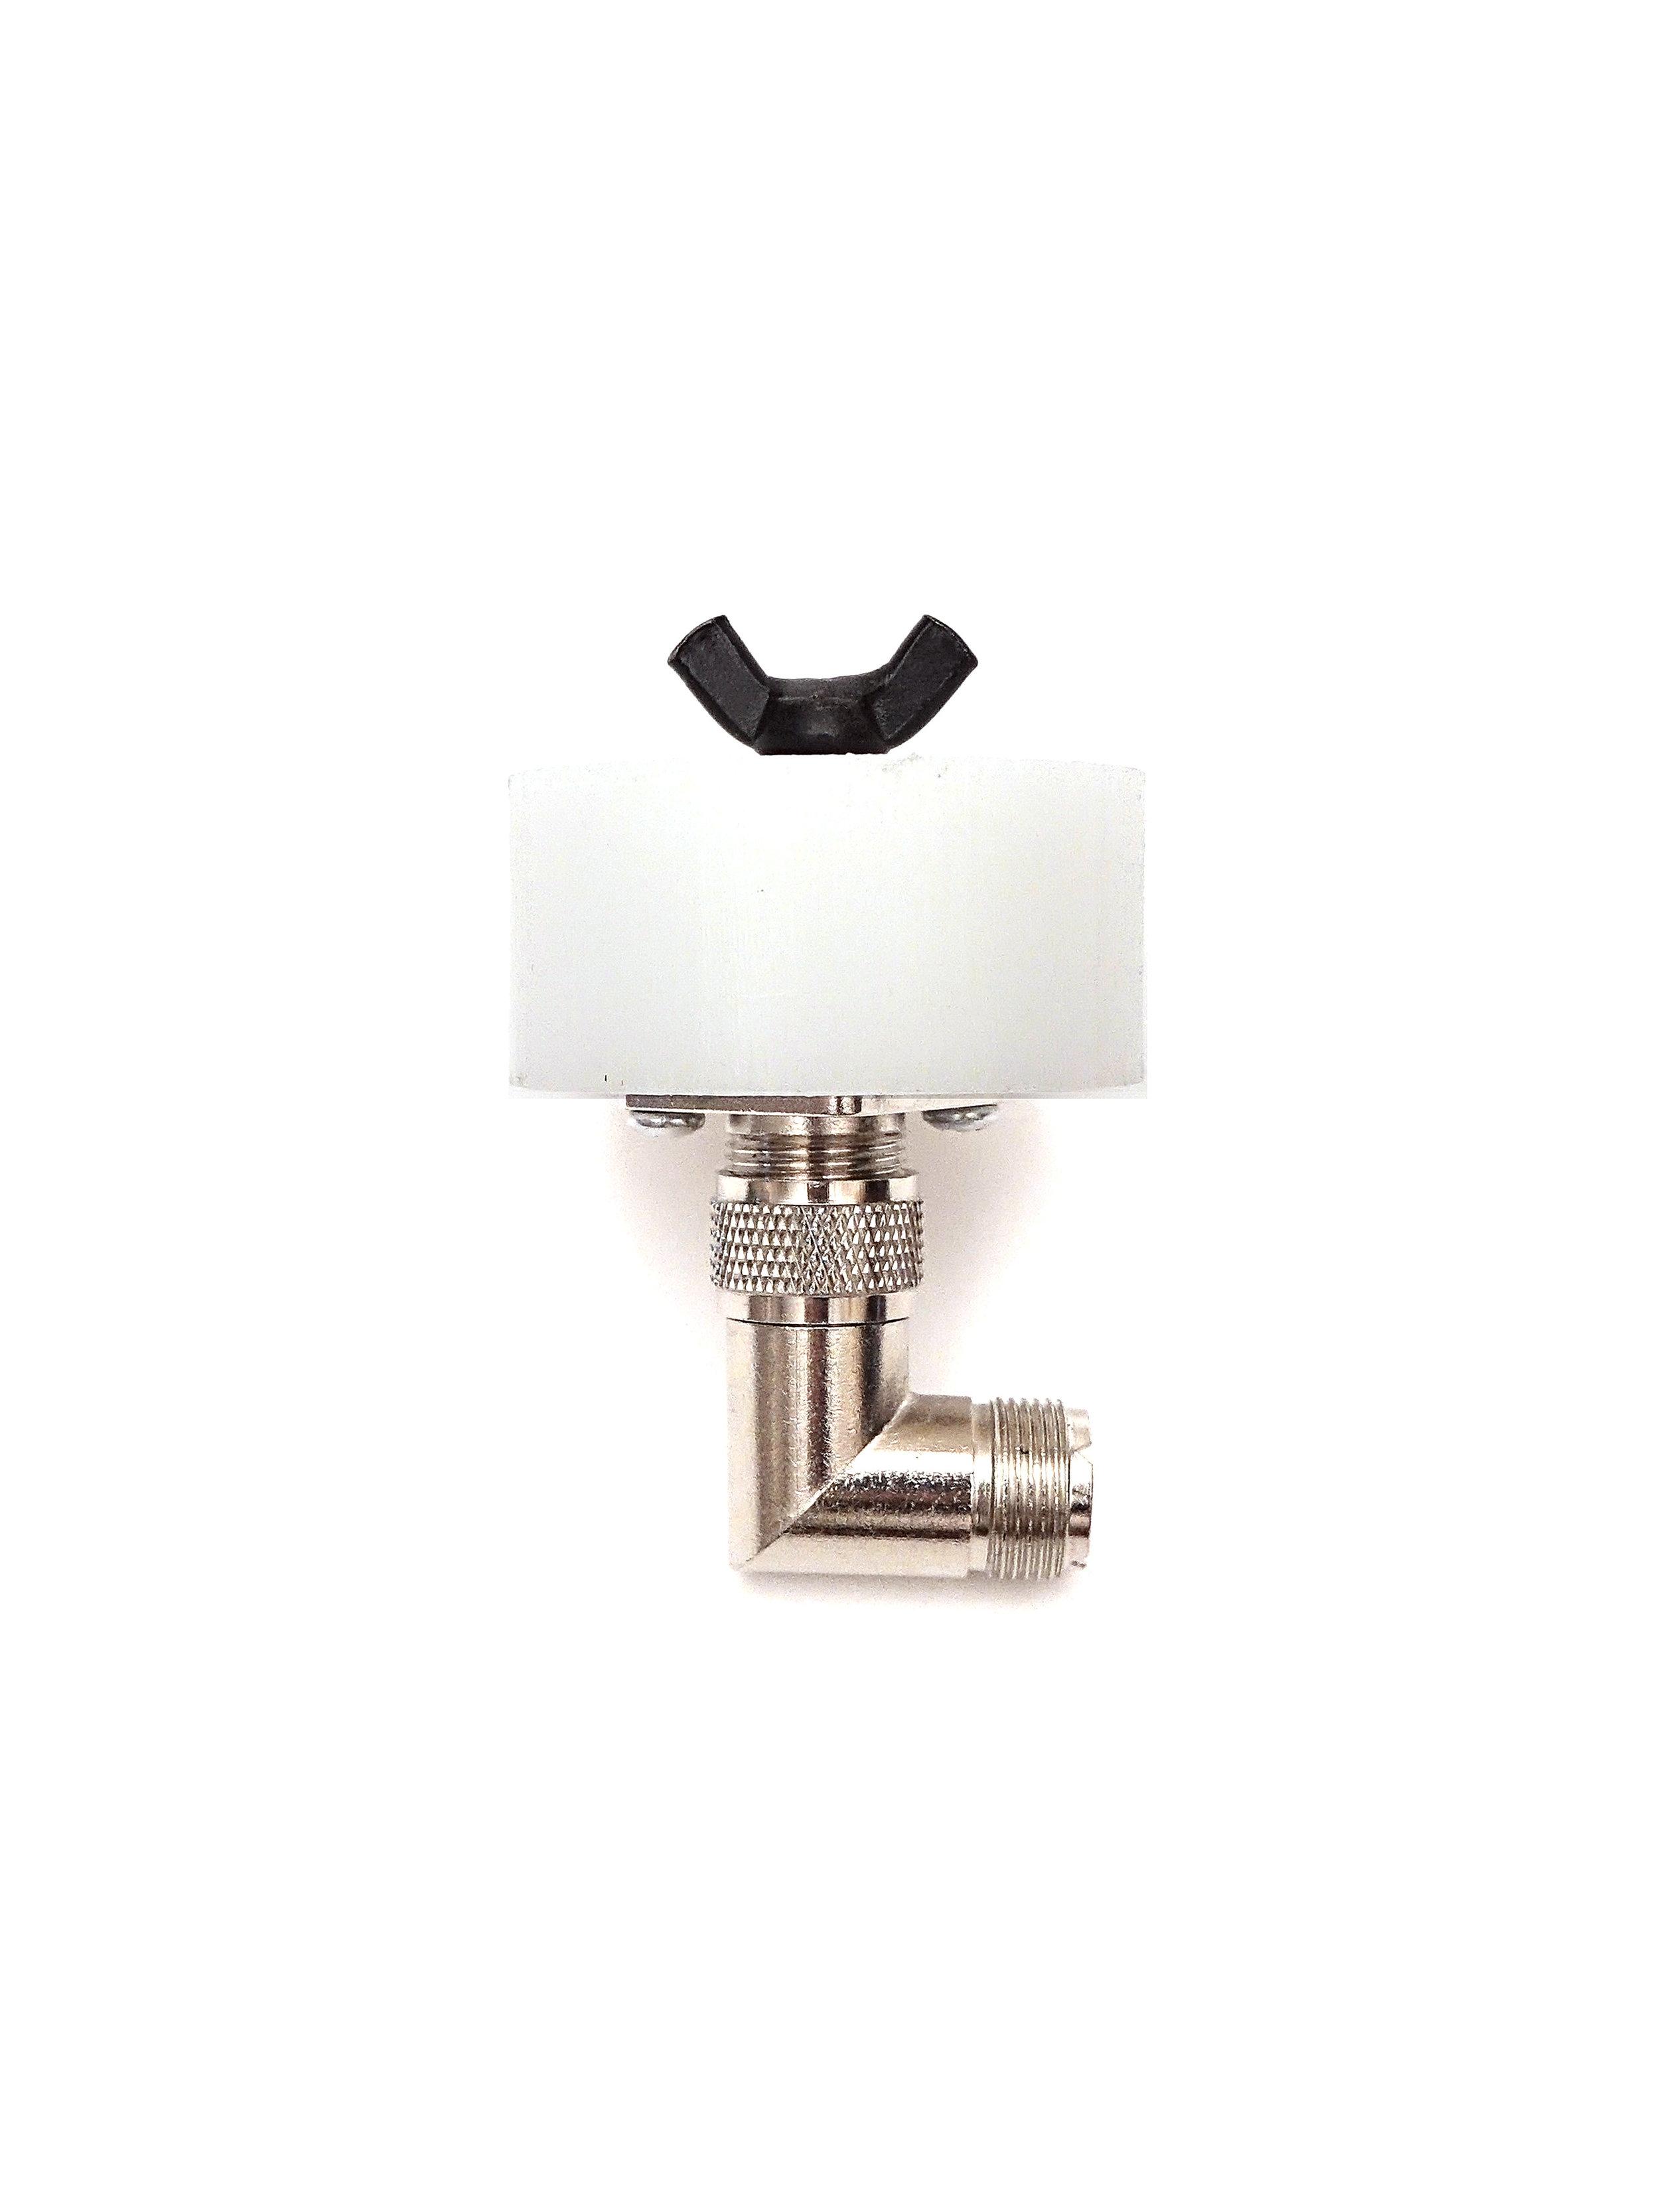 SFP-103 Adapter